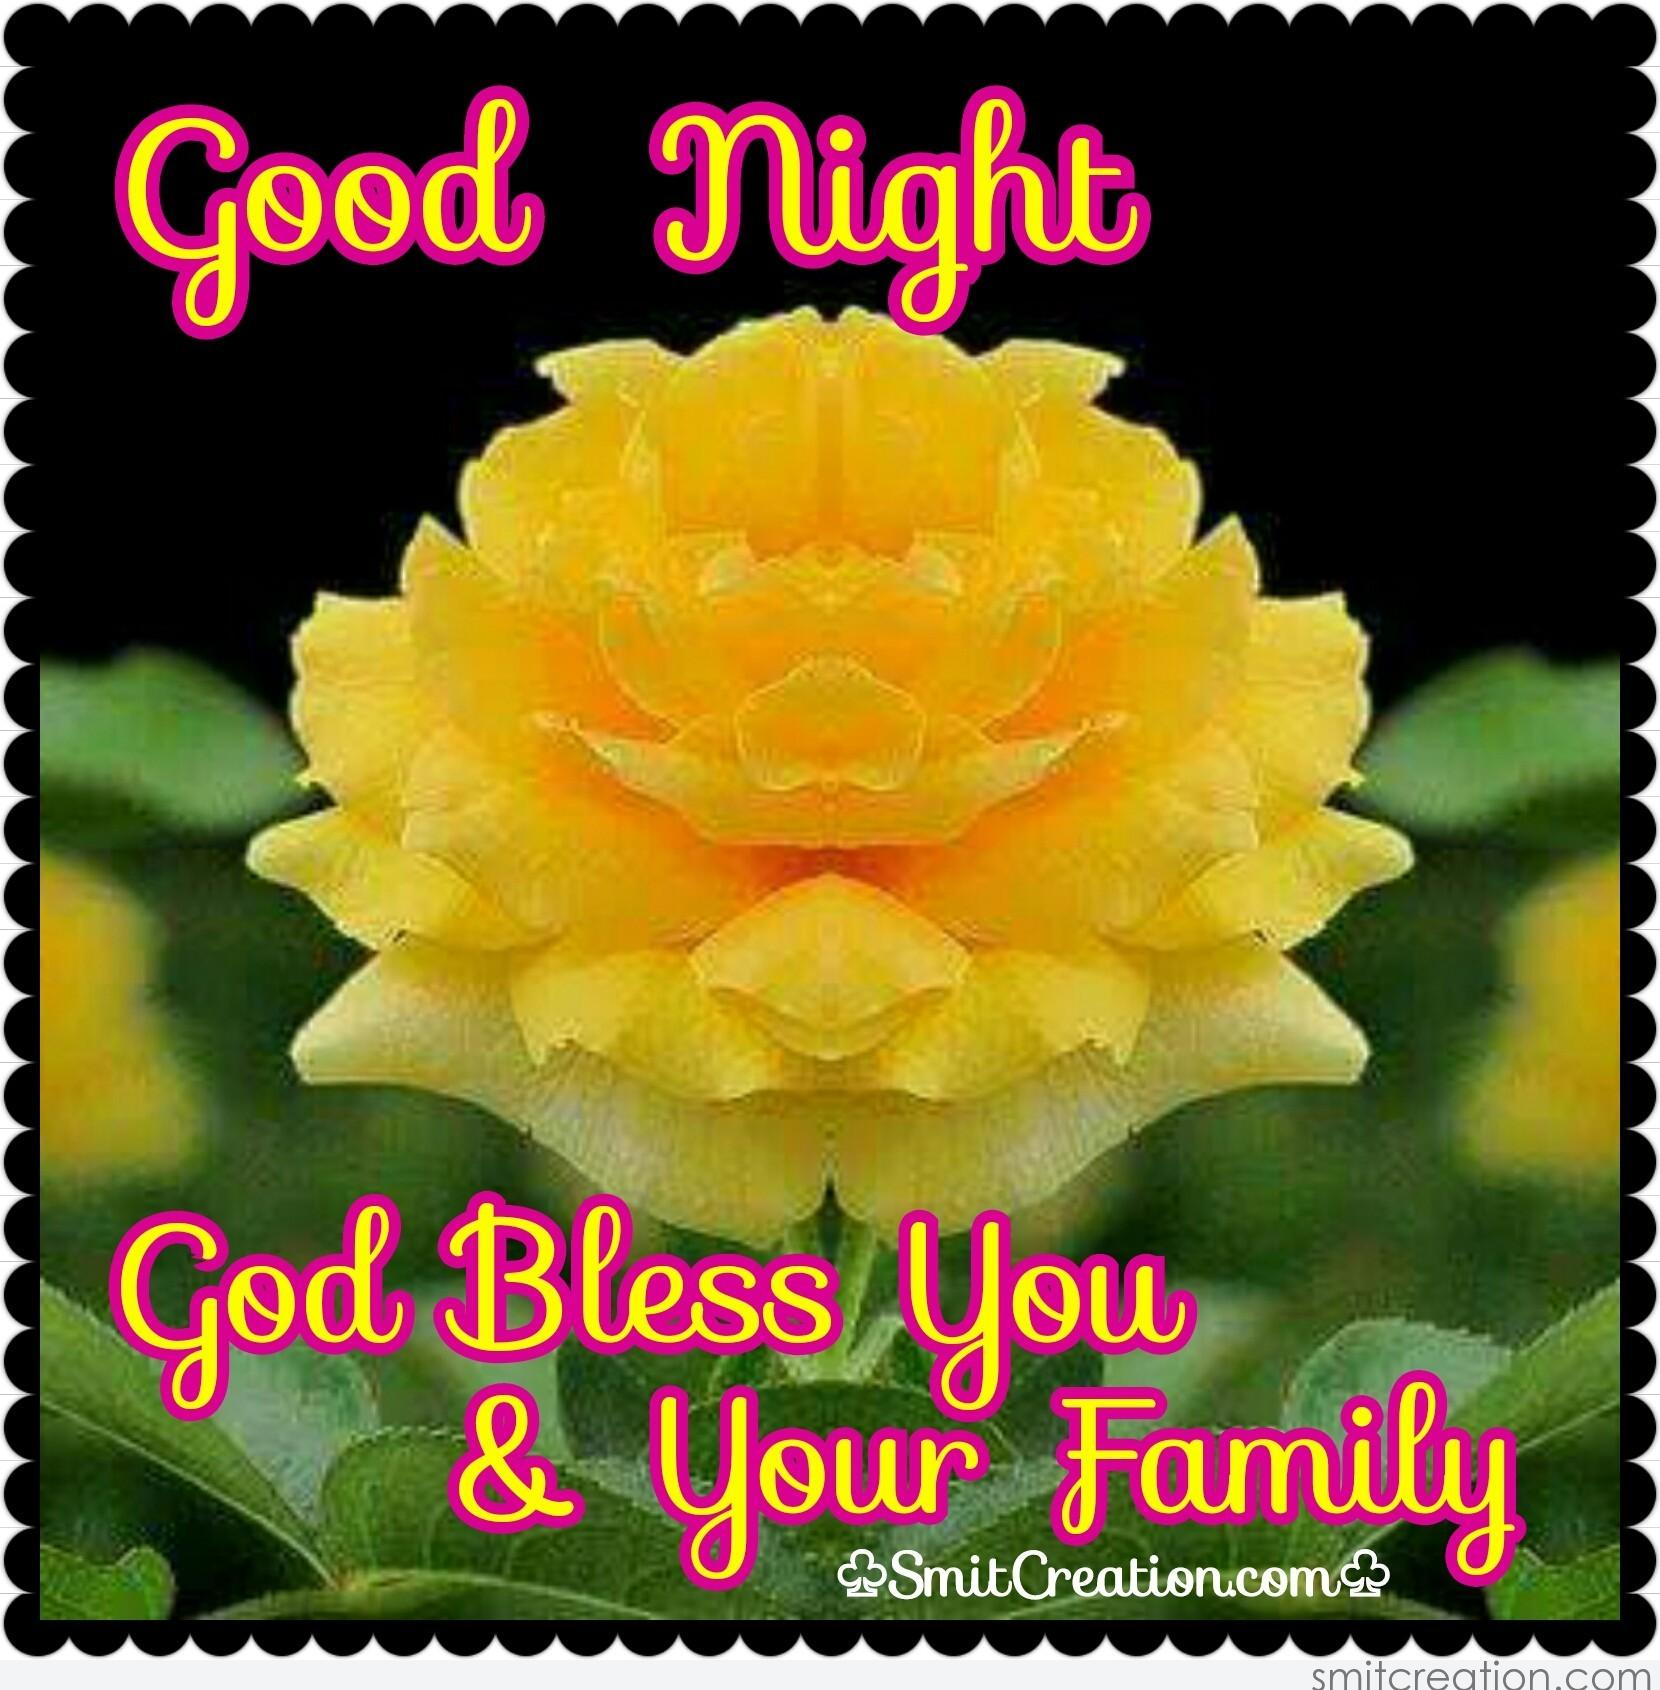 Good Night God Bless You Your Family Smitcreationcom